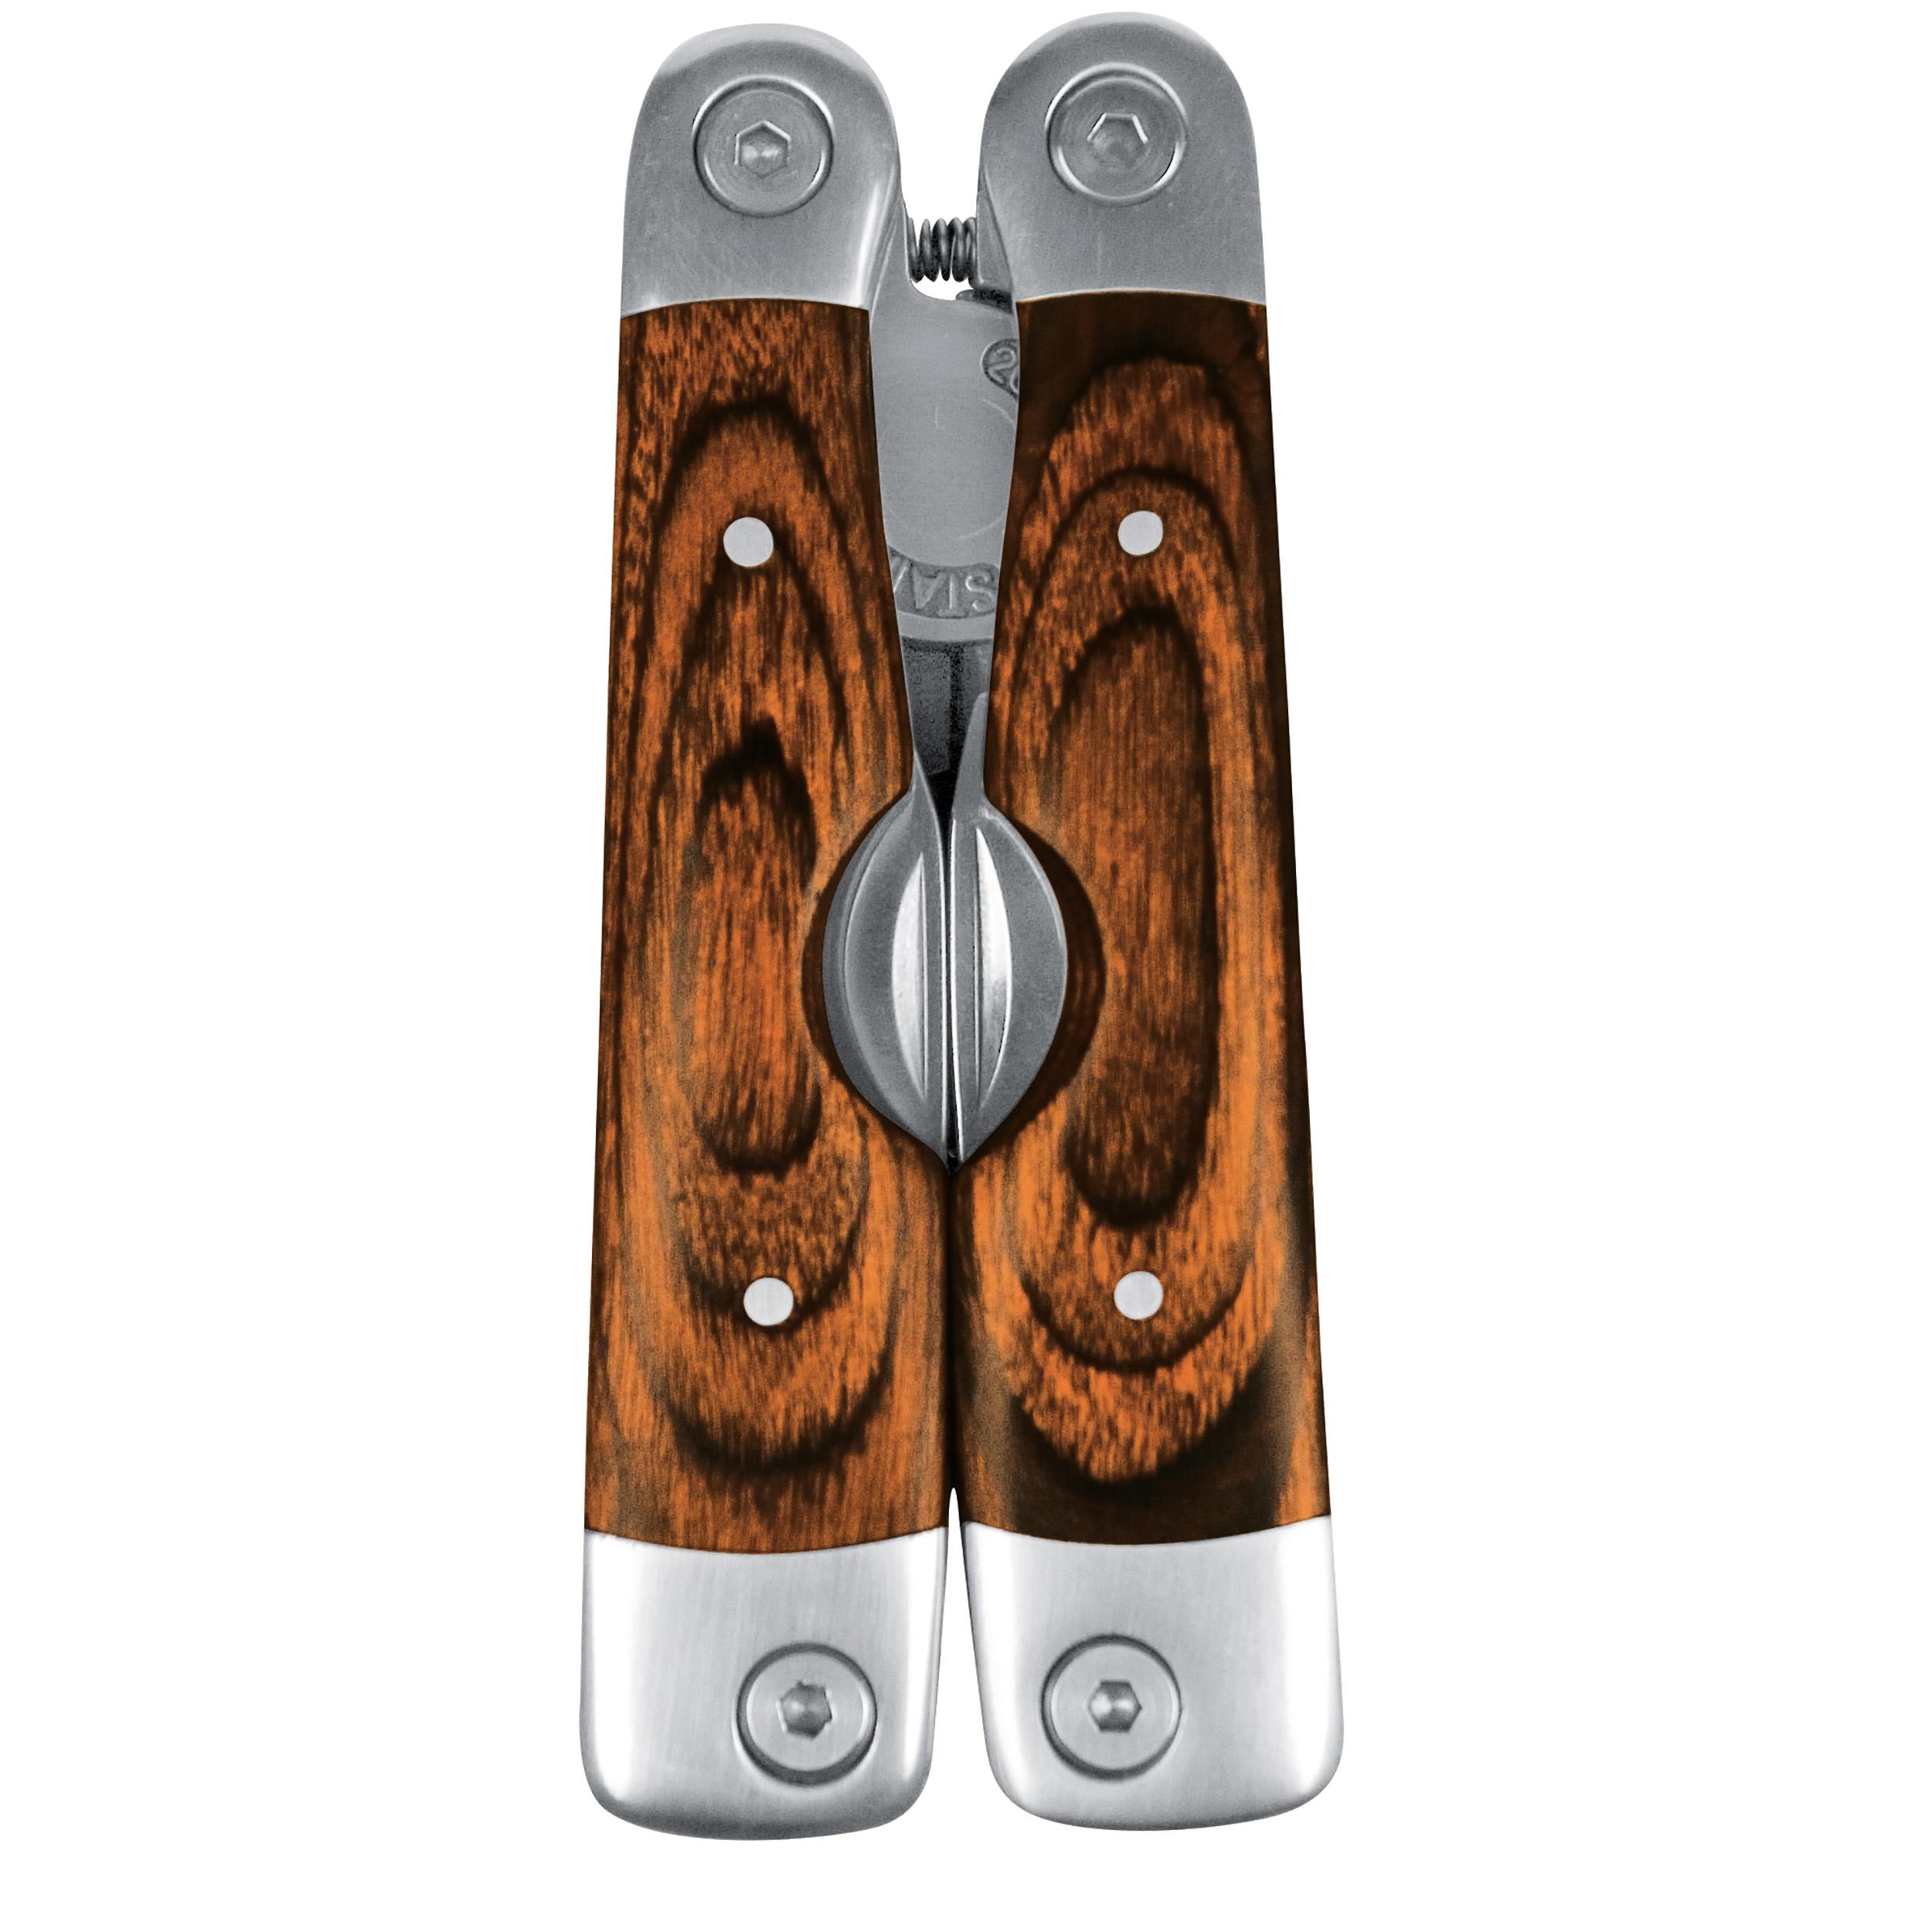 Multifunction tool, stainless steel